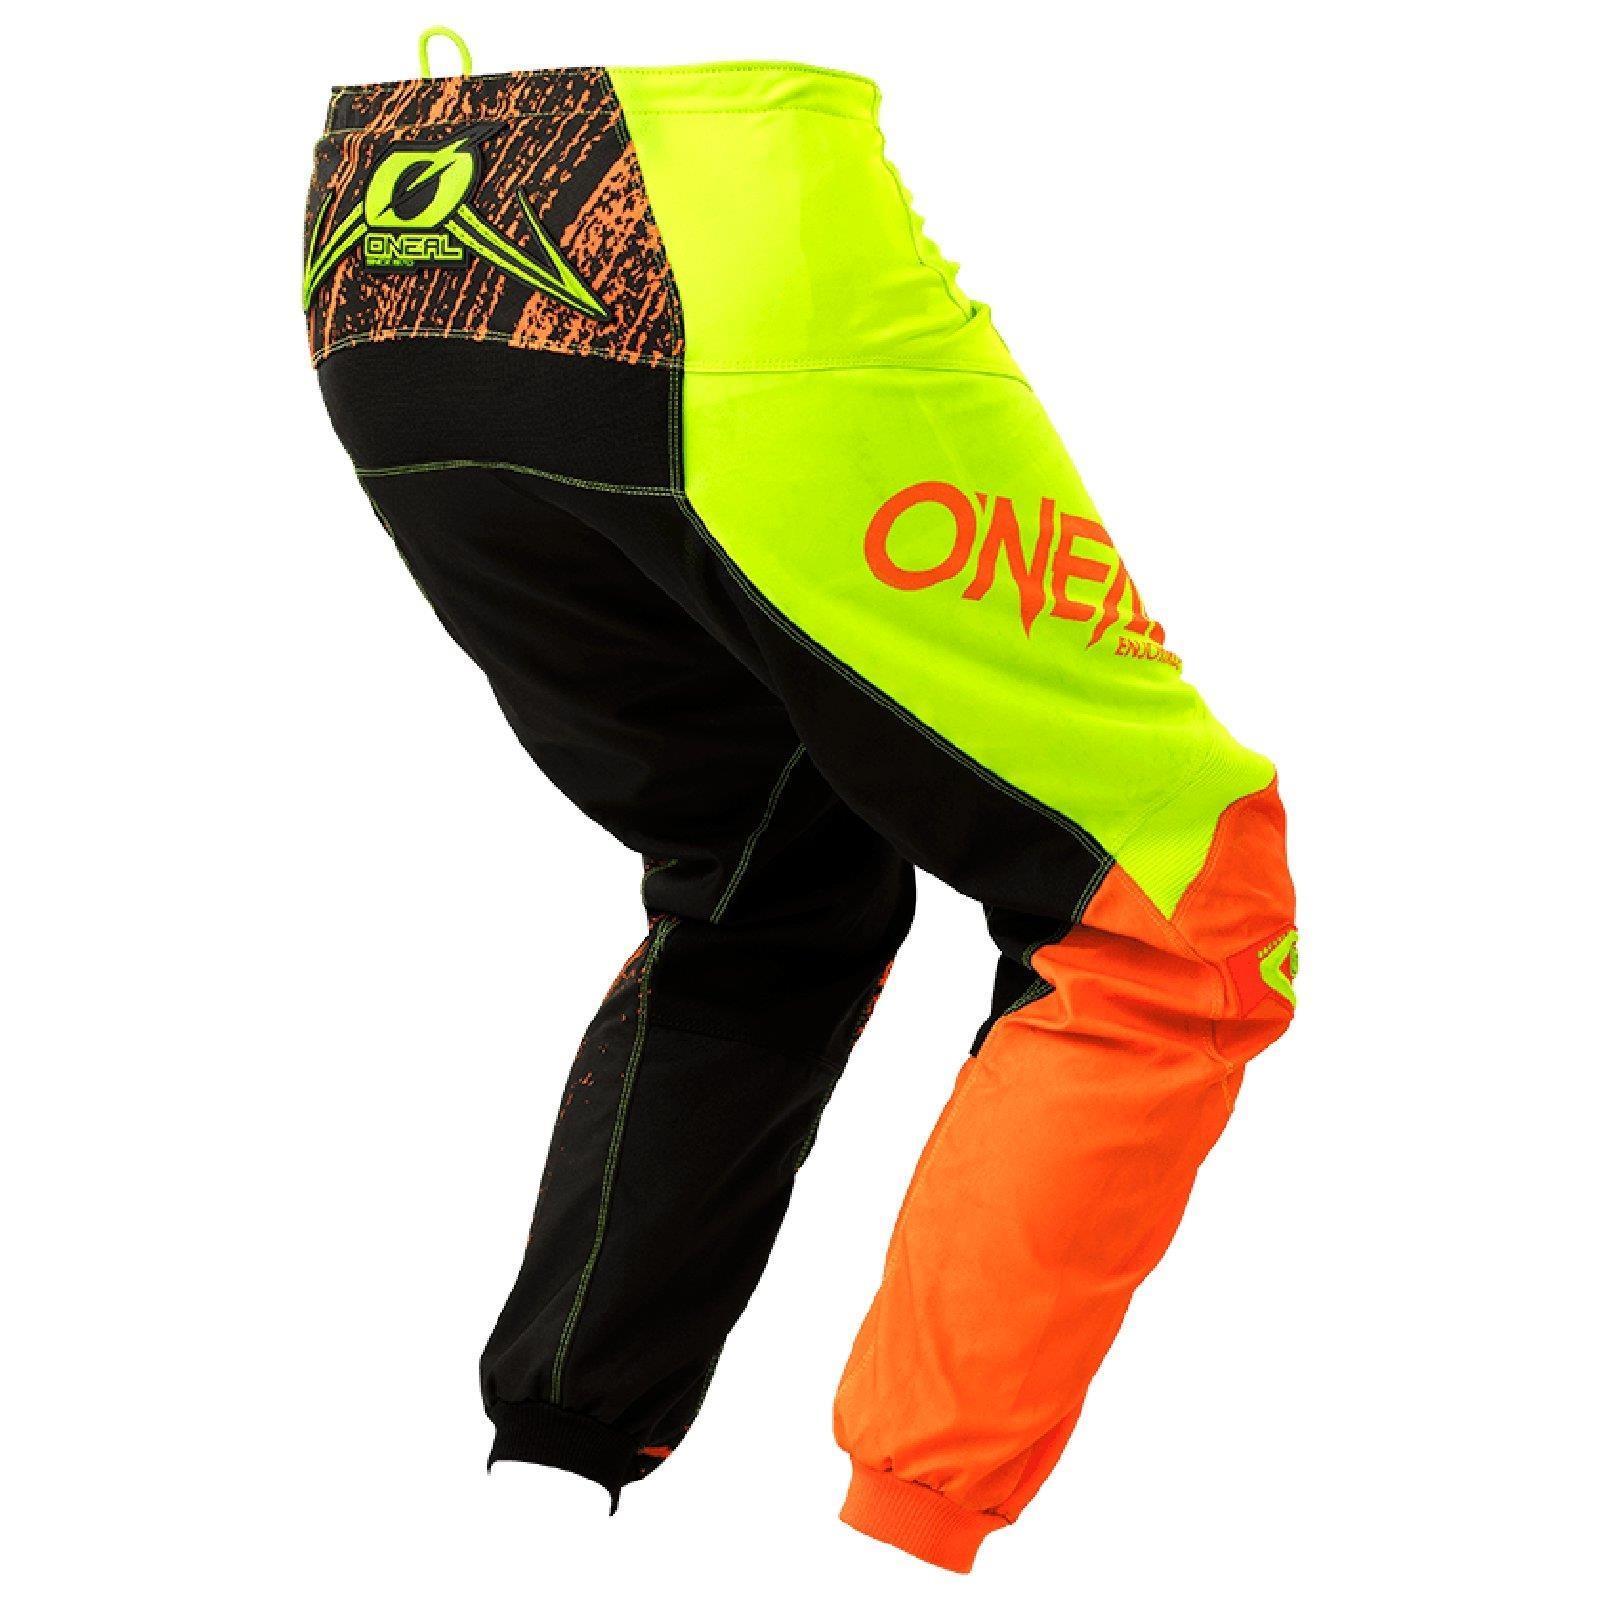 ONEAL-Element-Burnout-MX-Moto-Cross-Trousers-Pant-Enduro-Mountain-Bike-MTB-Downhill thumbnail 9